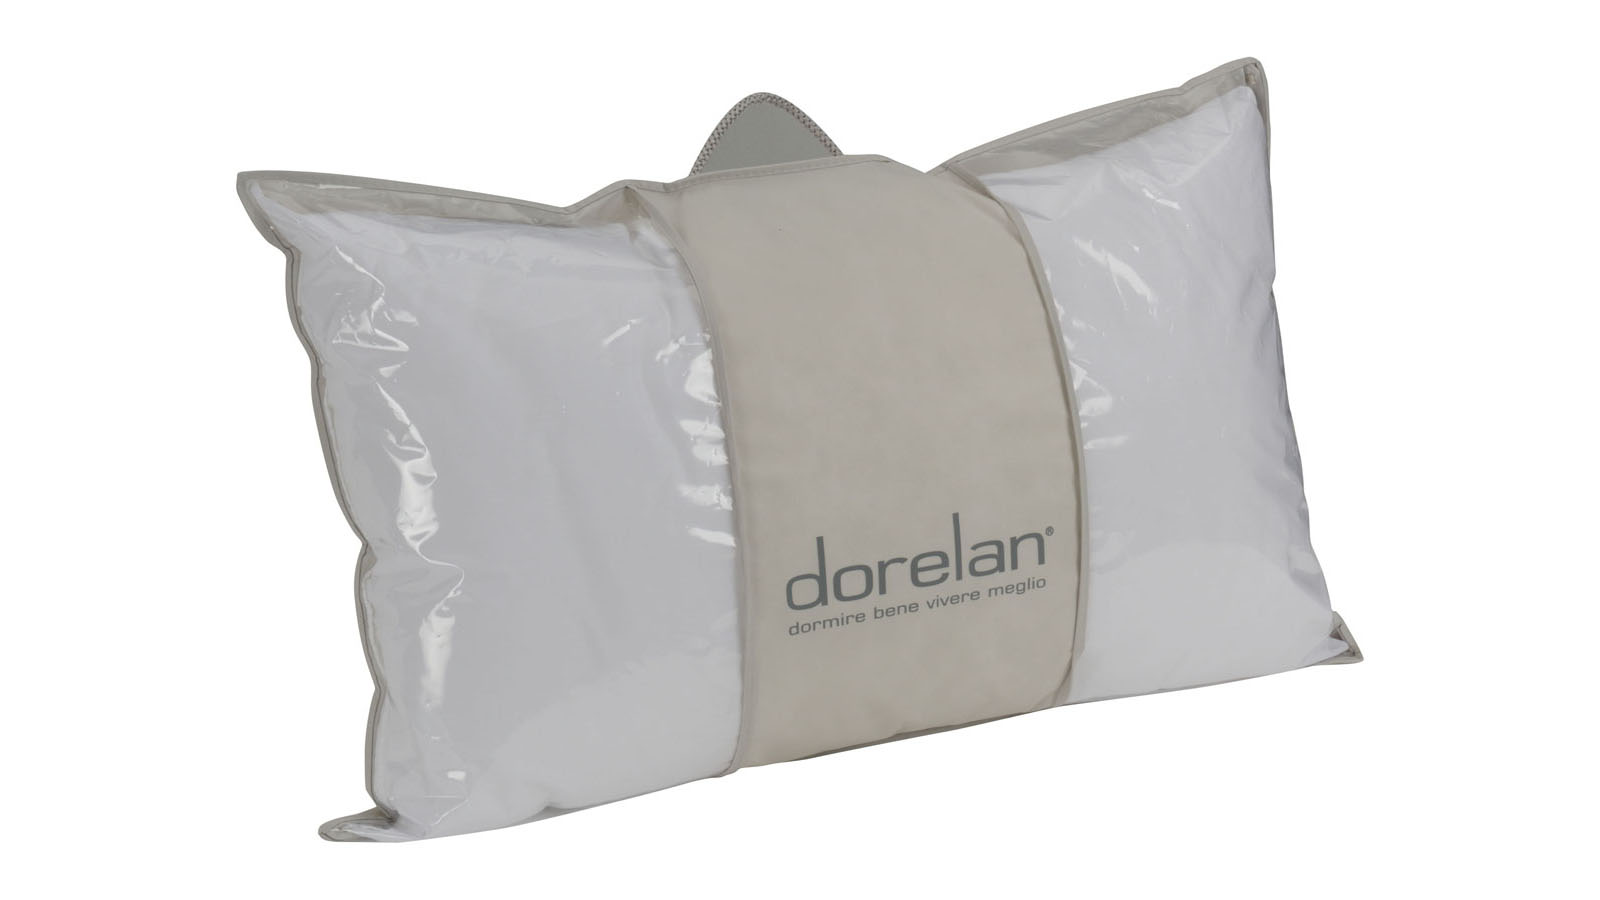 Cuscini Dorelan.Pillow Case For Hotels Dorelan Hotel